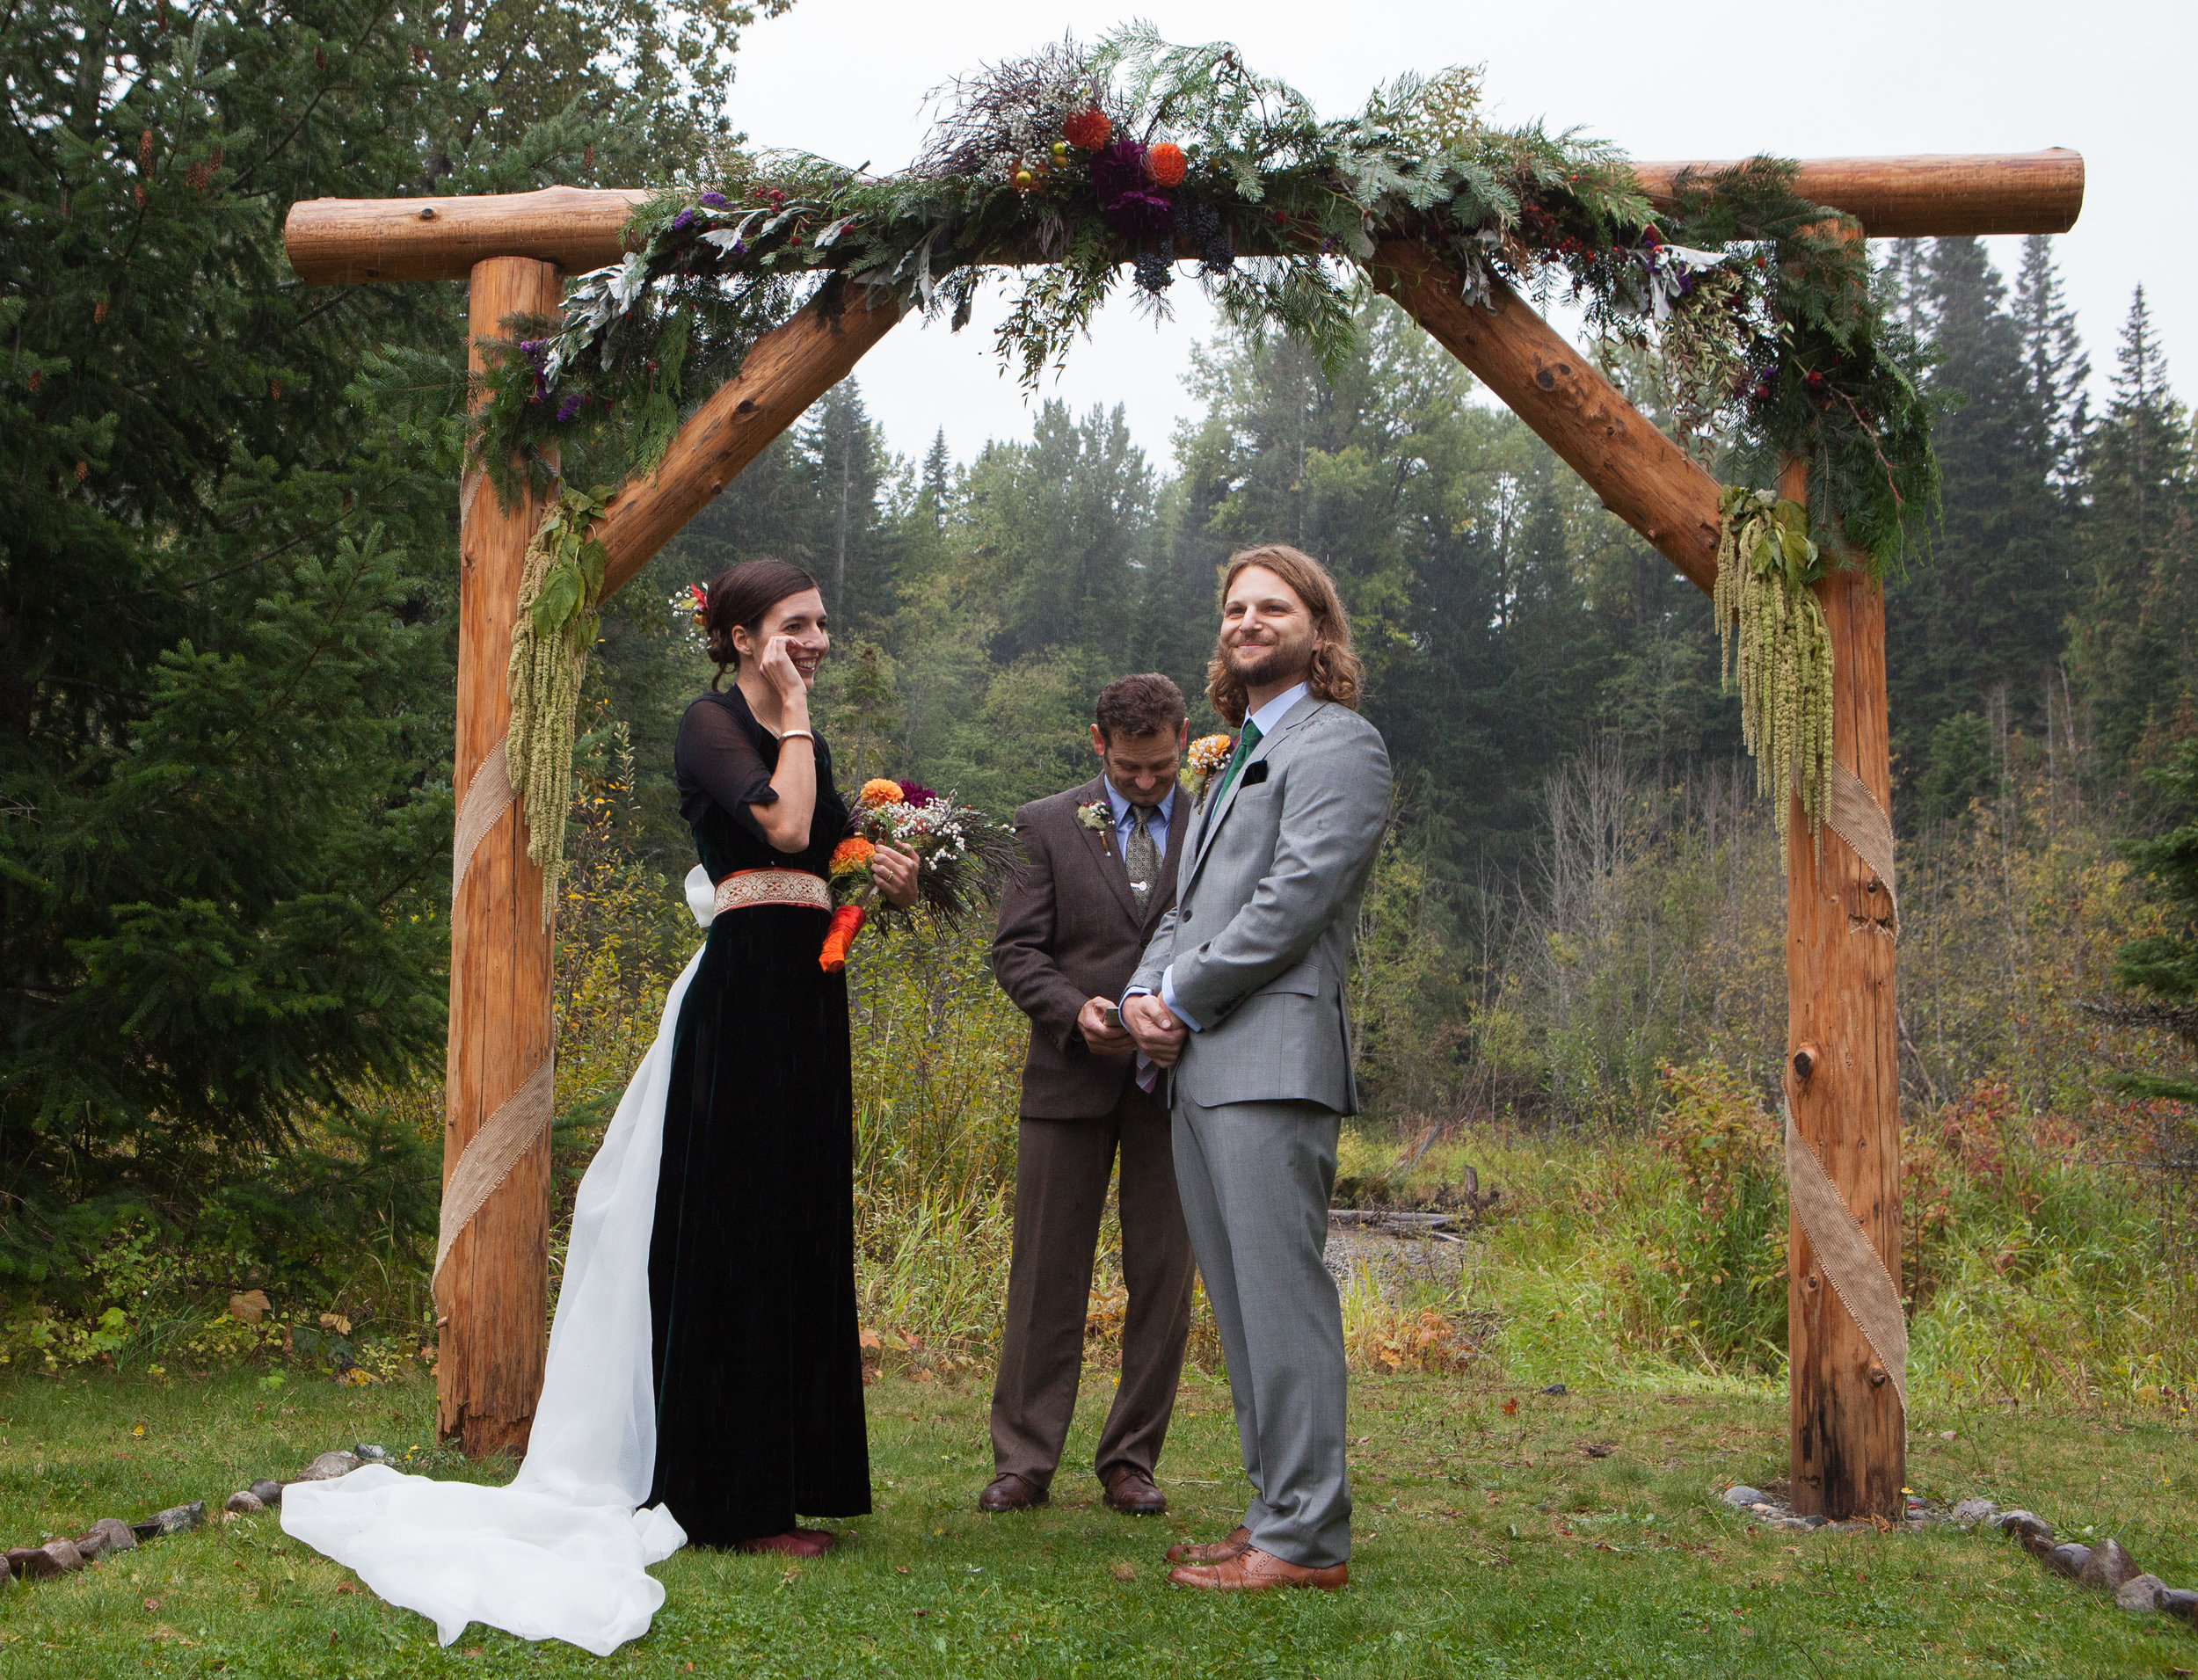 Rachel and Jon Lanman brave rain showers and tie the knot under the fall precipation on their wedding day. Easton, Washington.